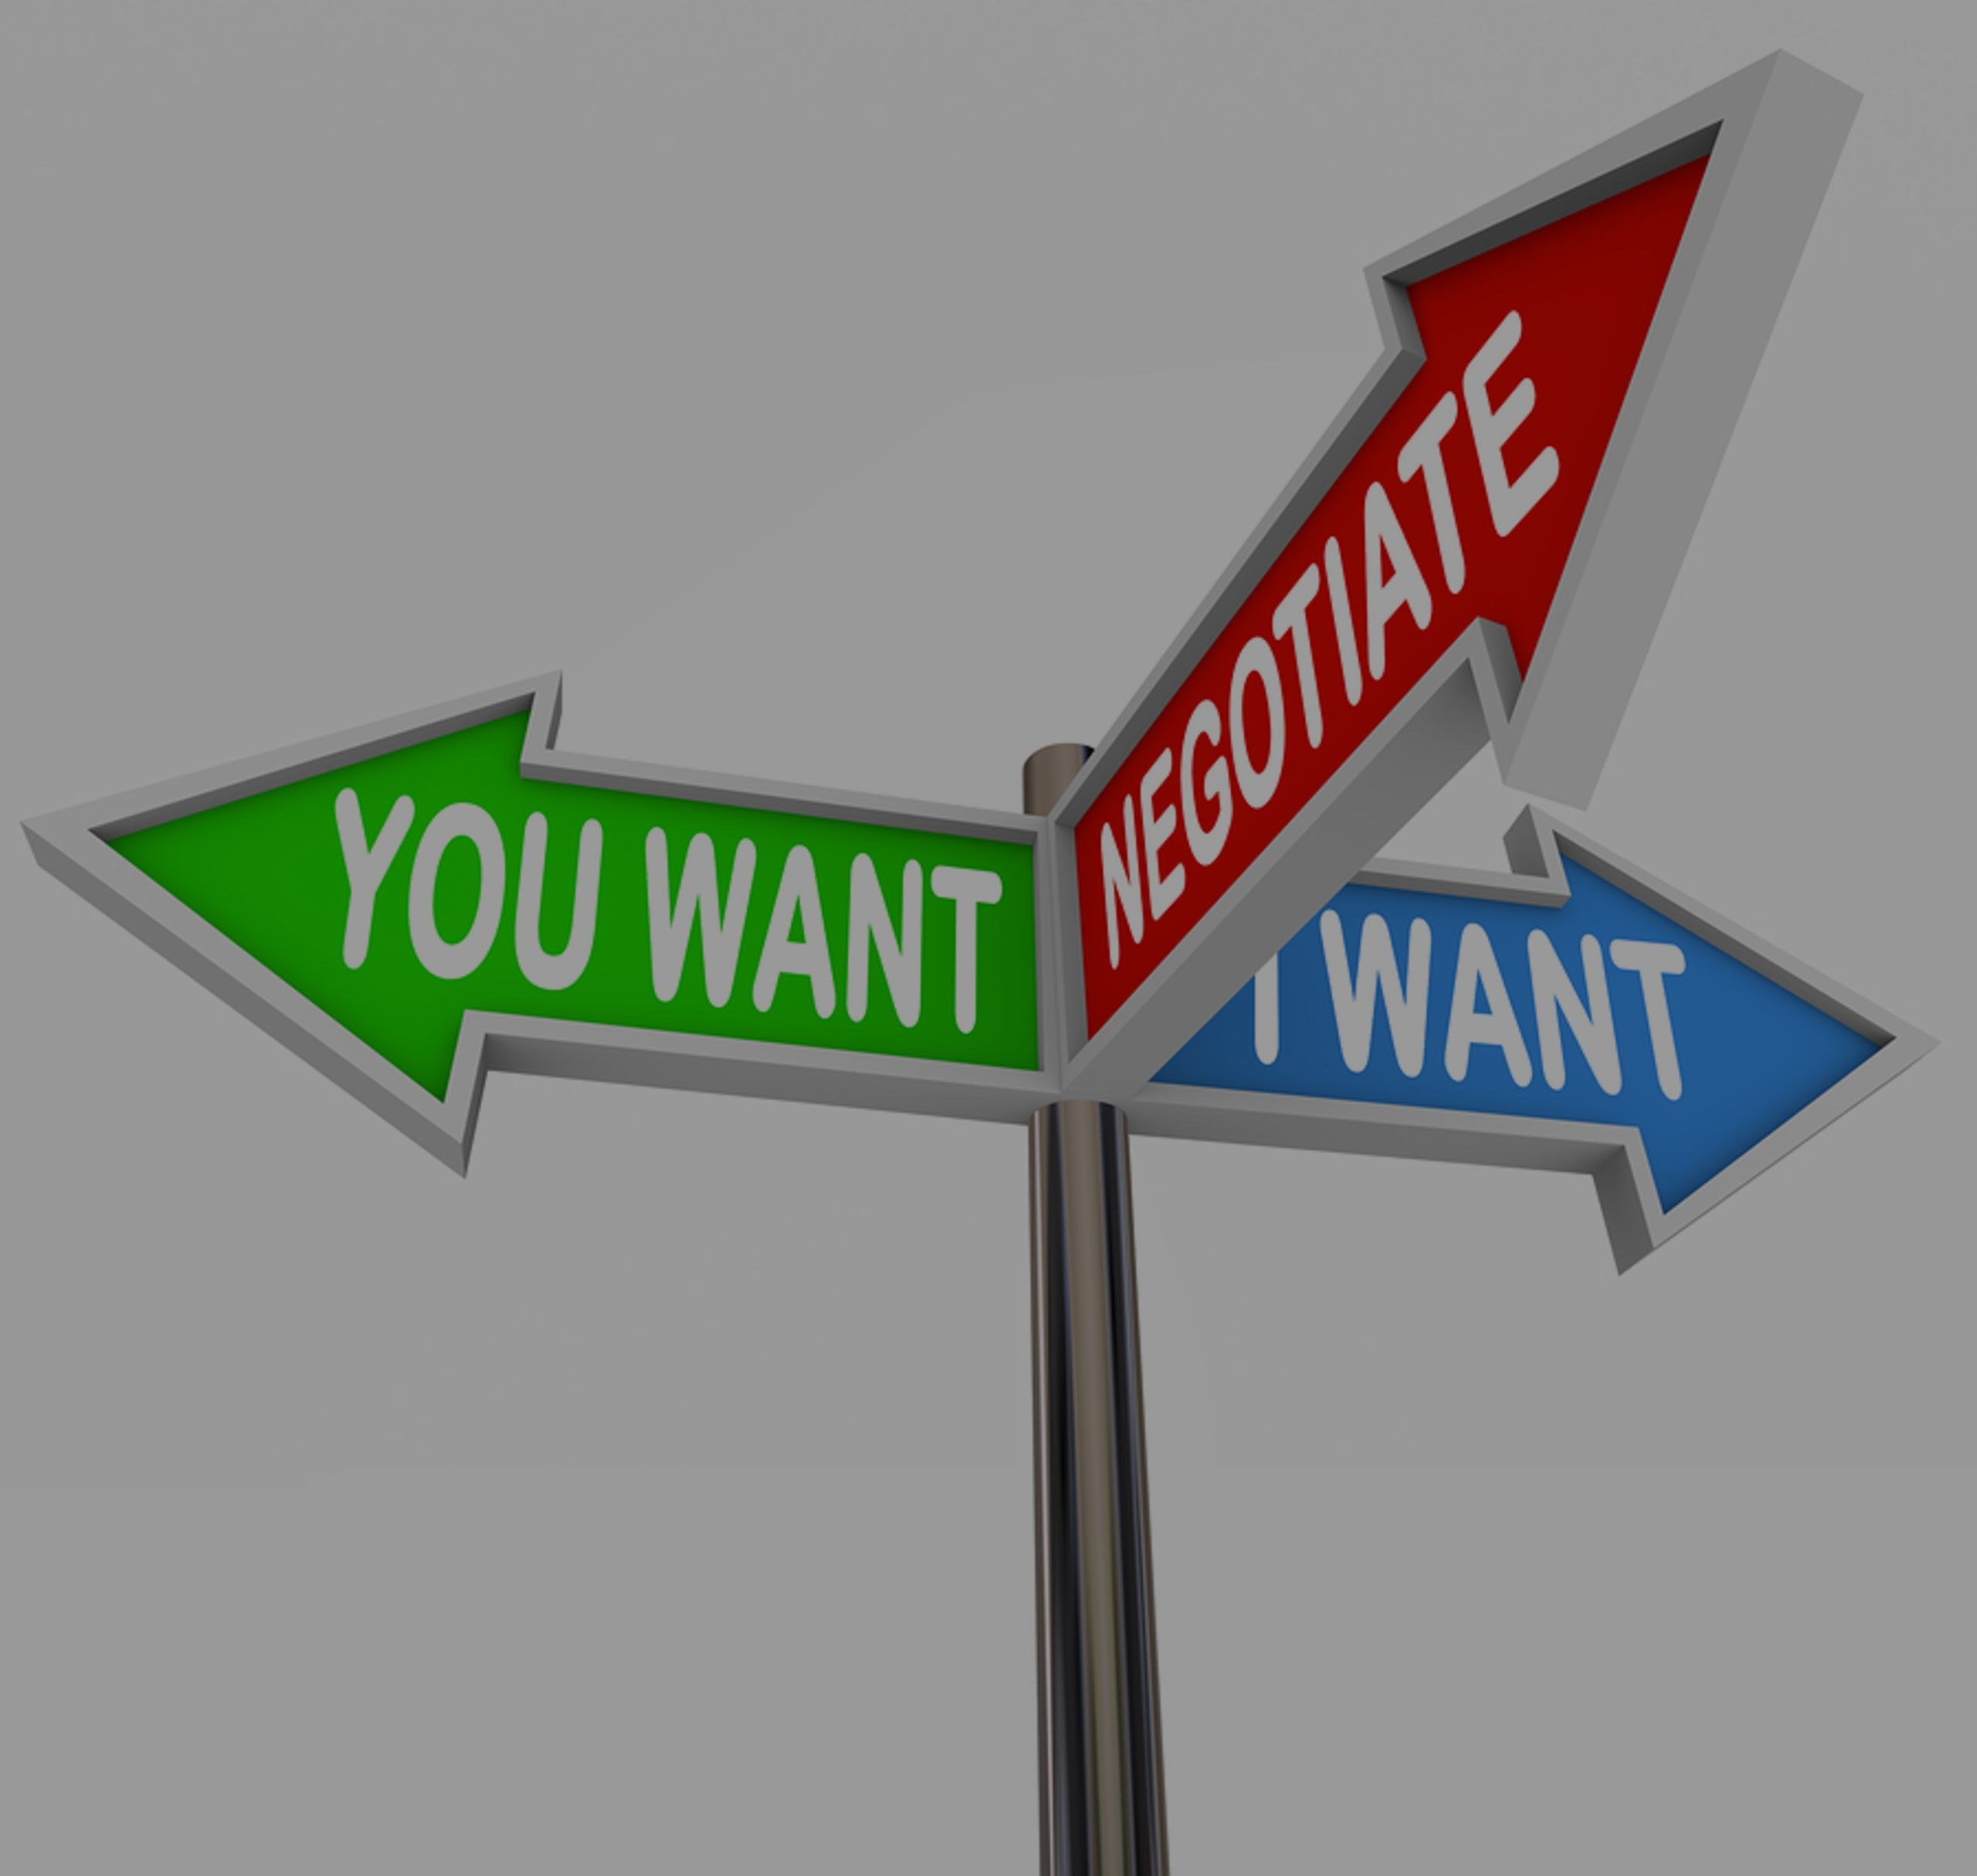 5 BUYER TIPS TO SUCCEED IN NEGOTIATIONS